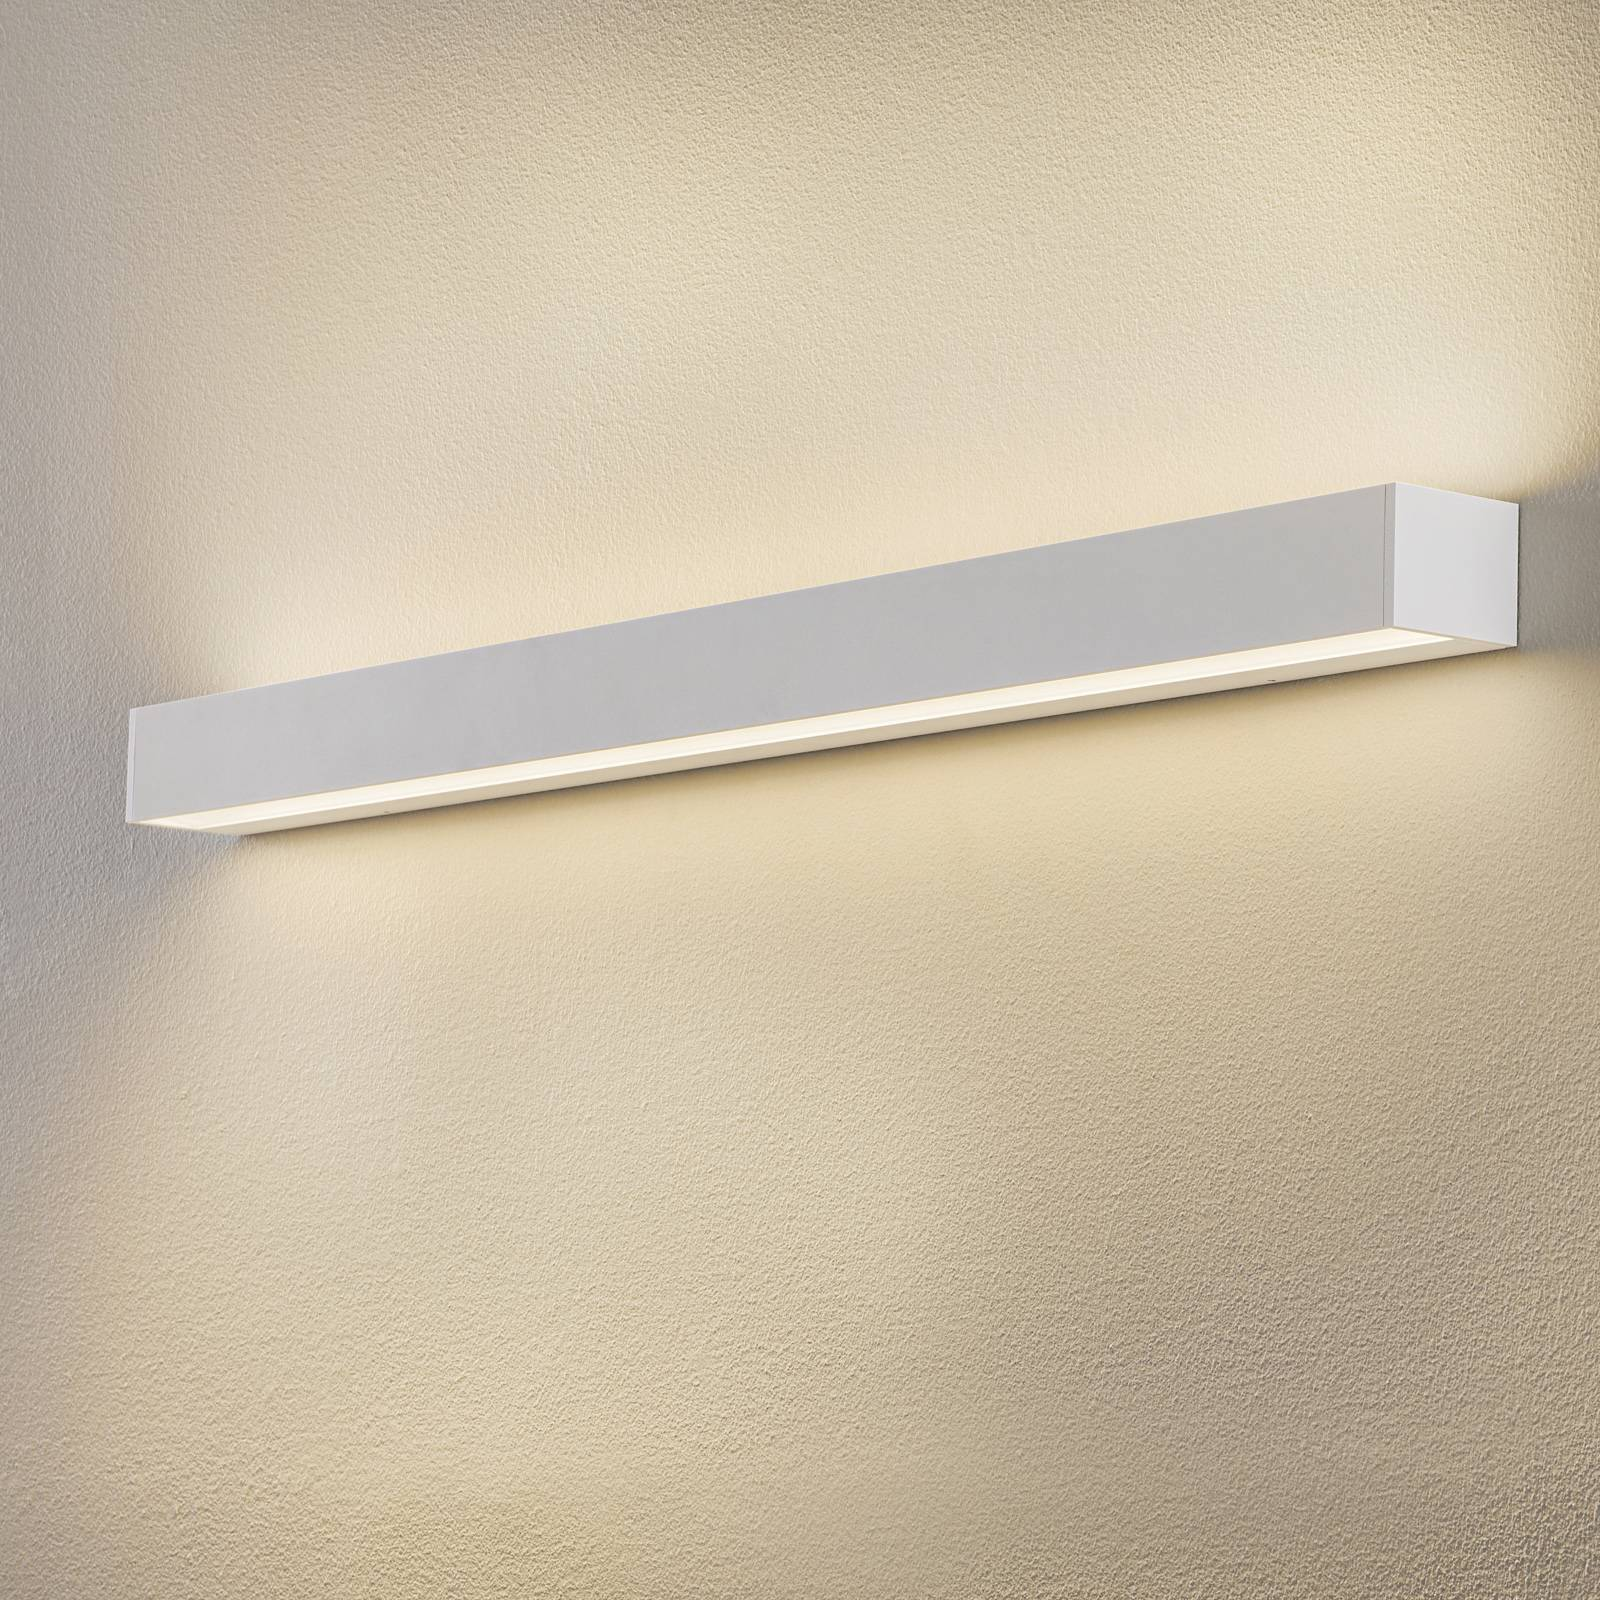 BEGA 50806 LED-seinälamppu valkoinen 12 360lm